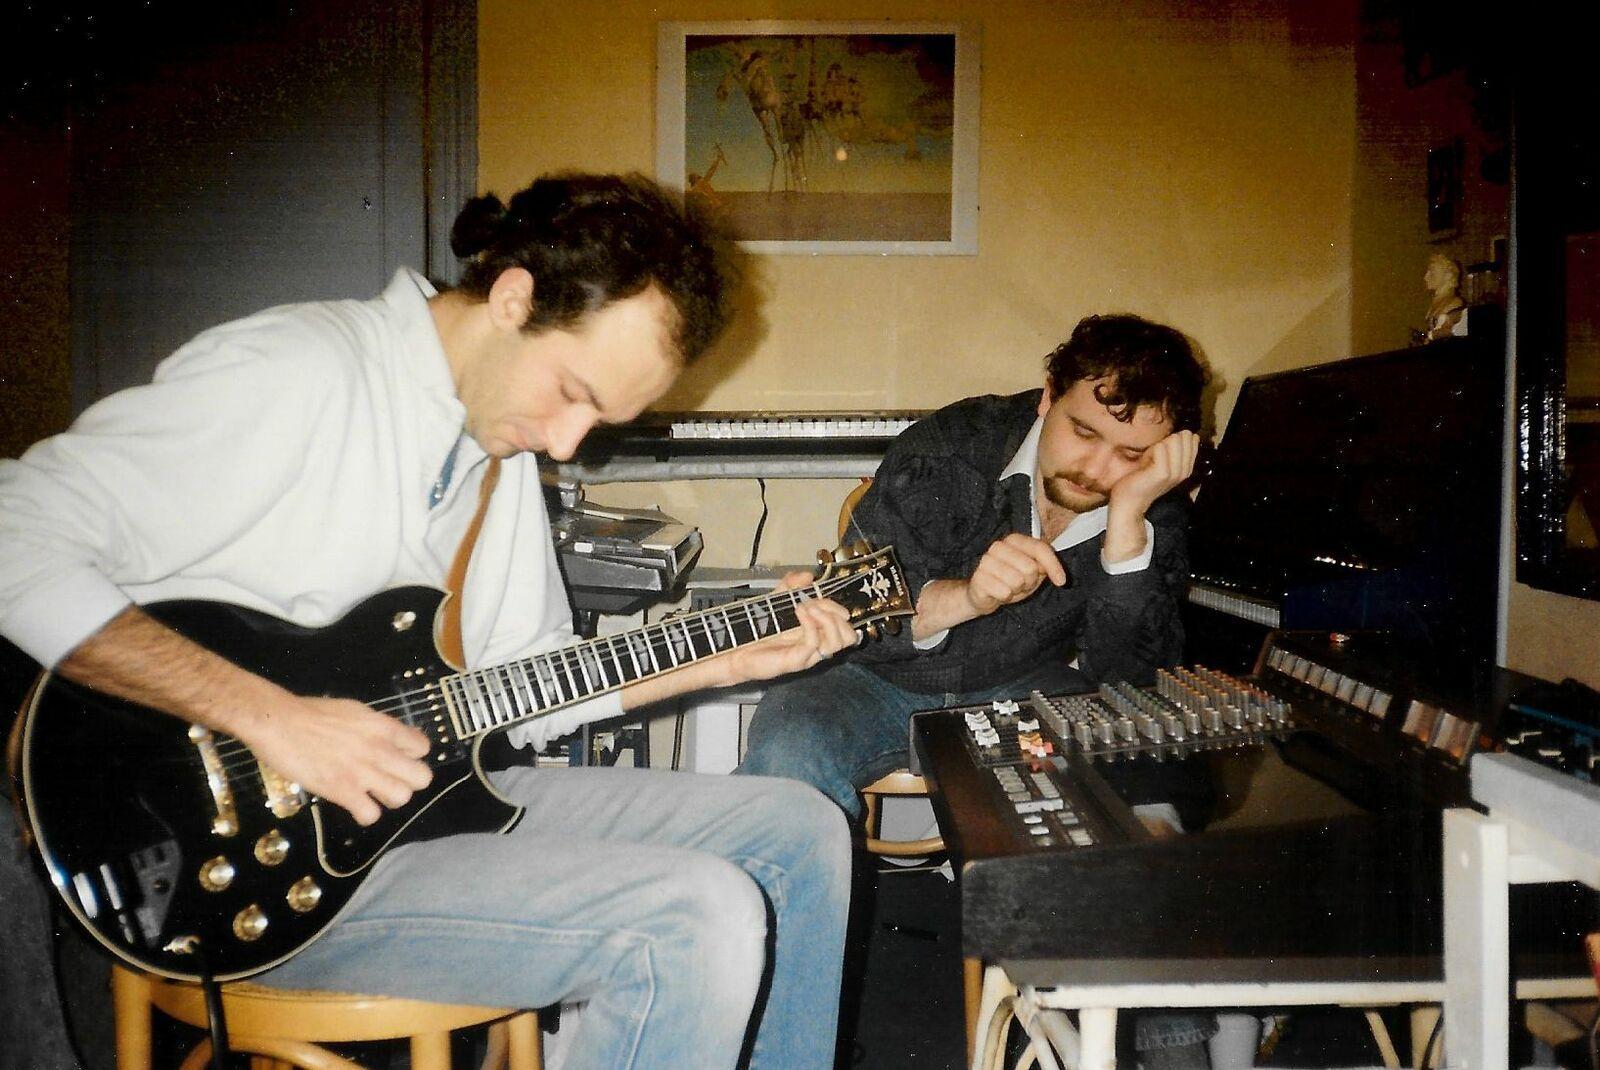 Edouard Poujaud and Rémy Hennequin, Paris 1988